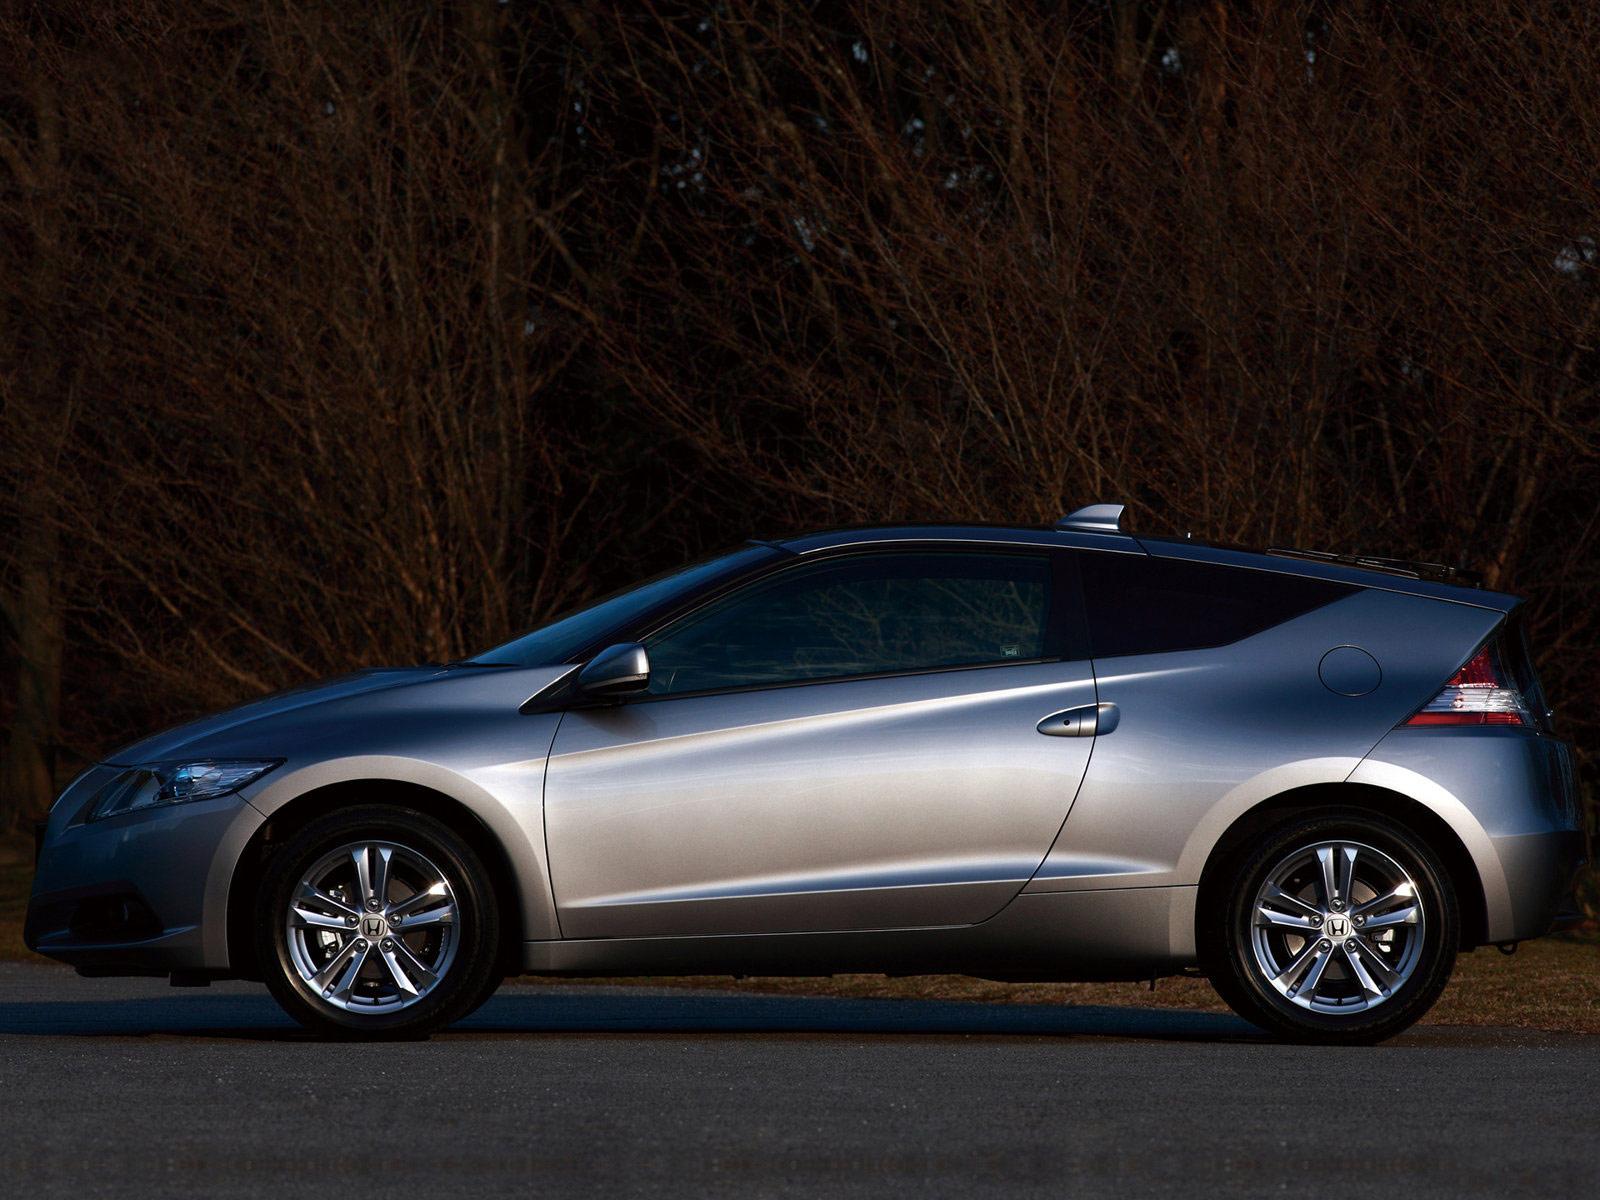 2011 Honda Cr Z Japanese Car Wallpapers